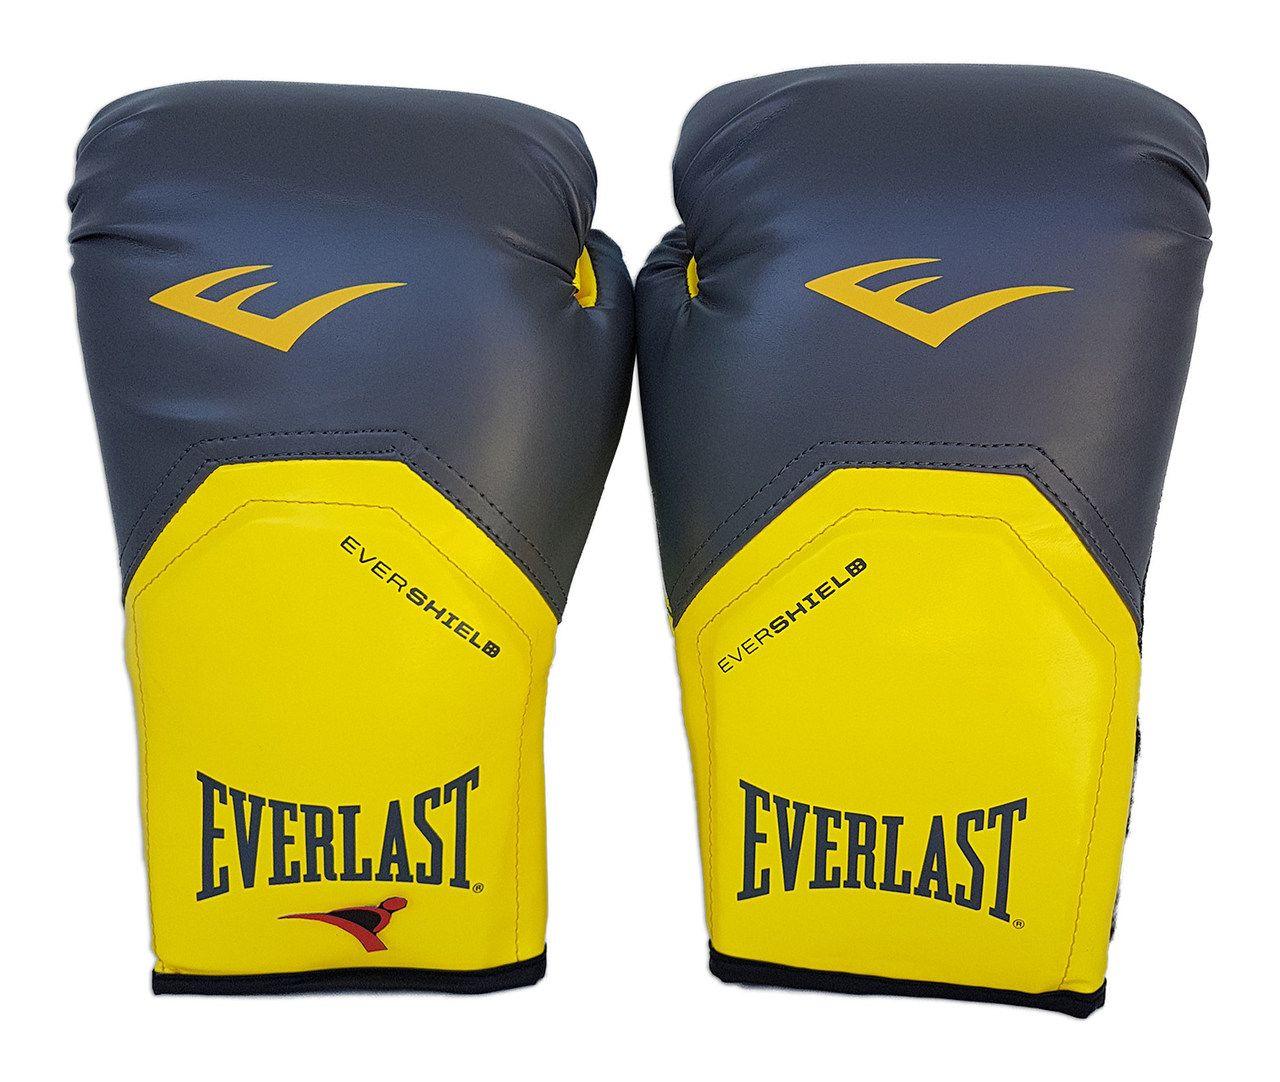 Luva de Boxe / Muay Thai 12oz - Cinza com Amarelo - Pro Style - Everlast  - PRALUTA SHOP